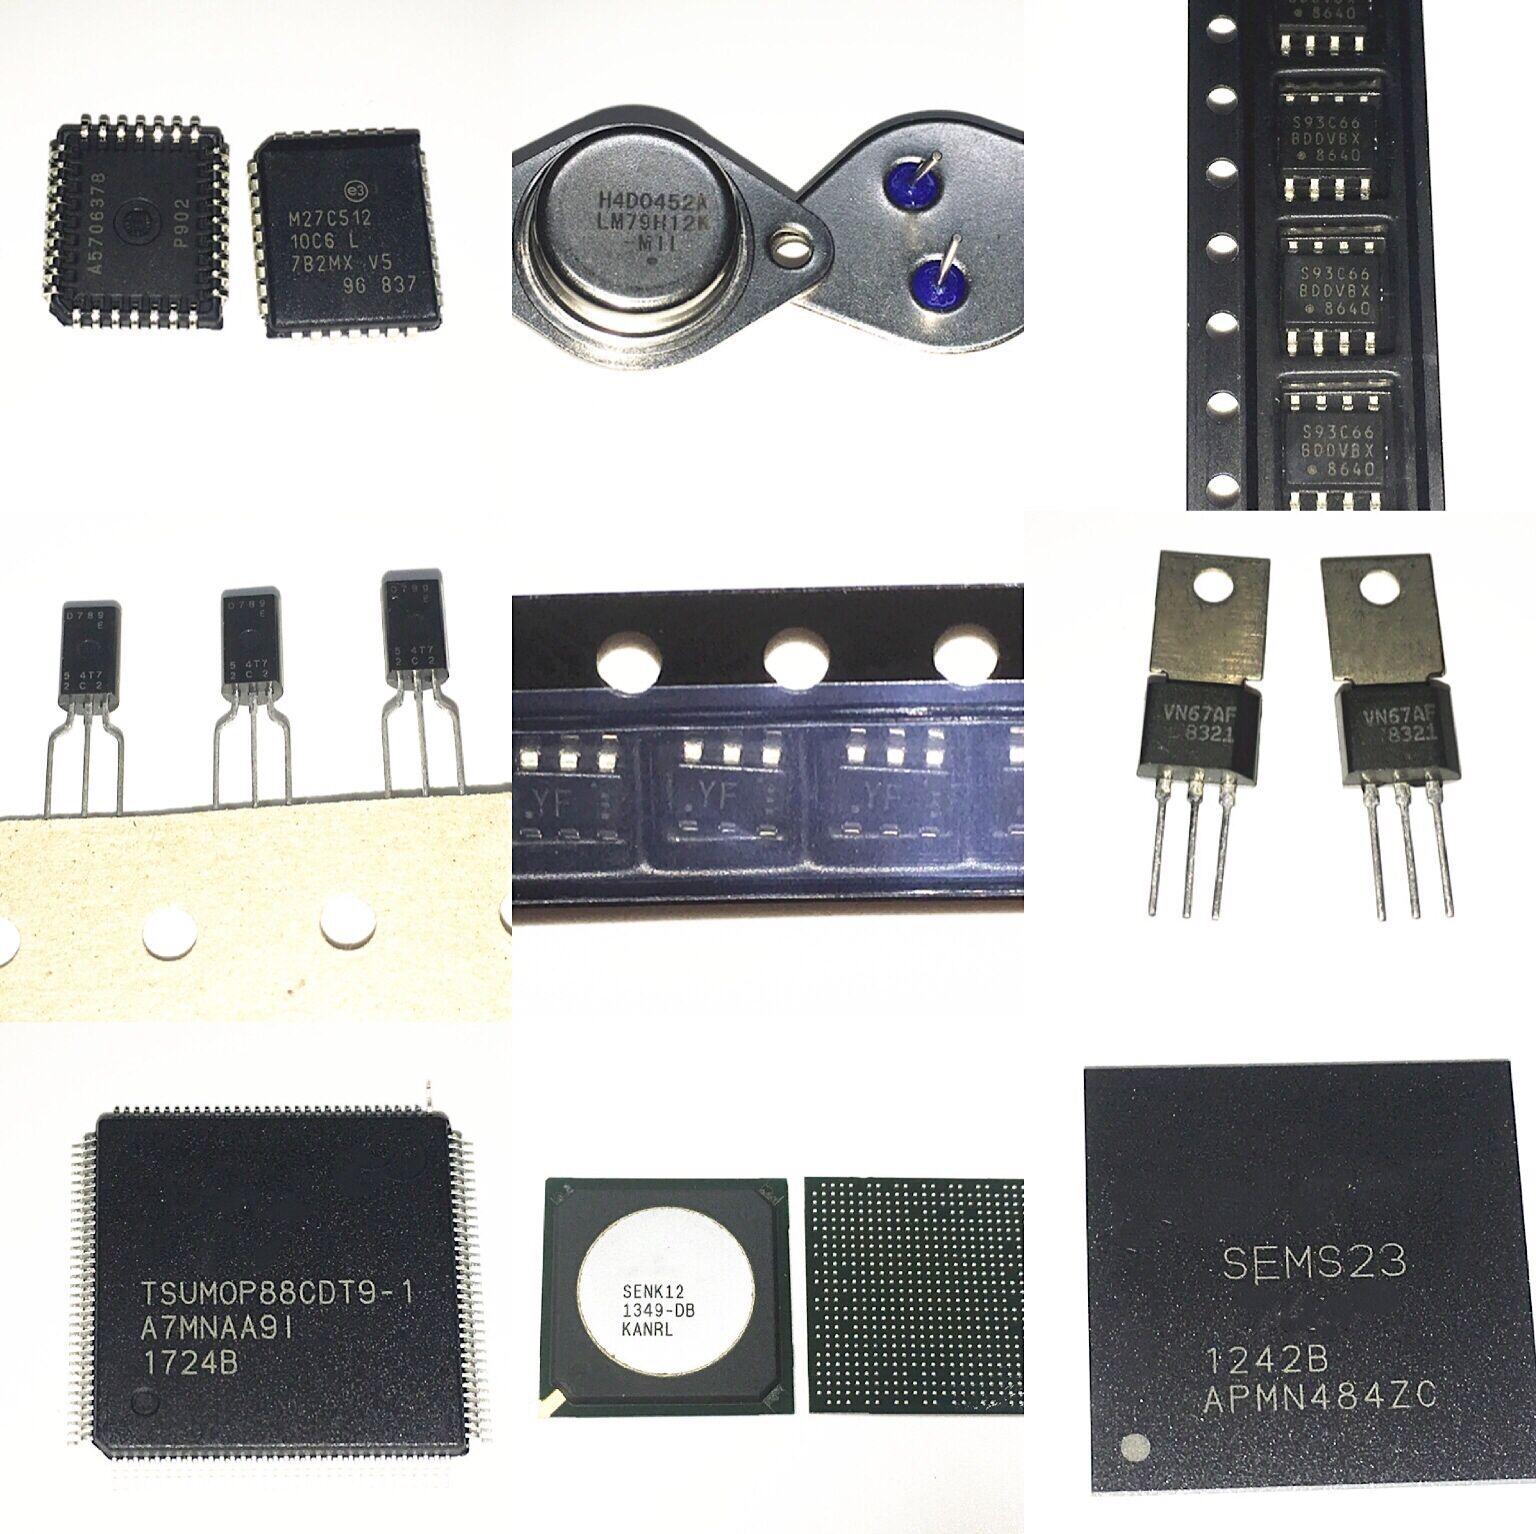 10PCS Ic Tl074cn Op Amp Quad Gp 15v 14-pin Pdip Chip Tl074